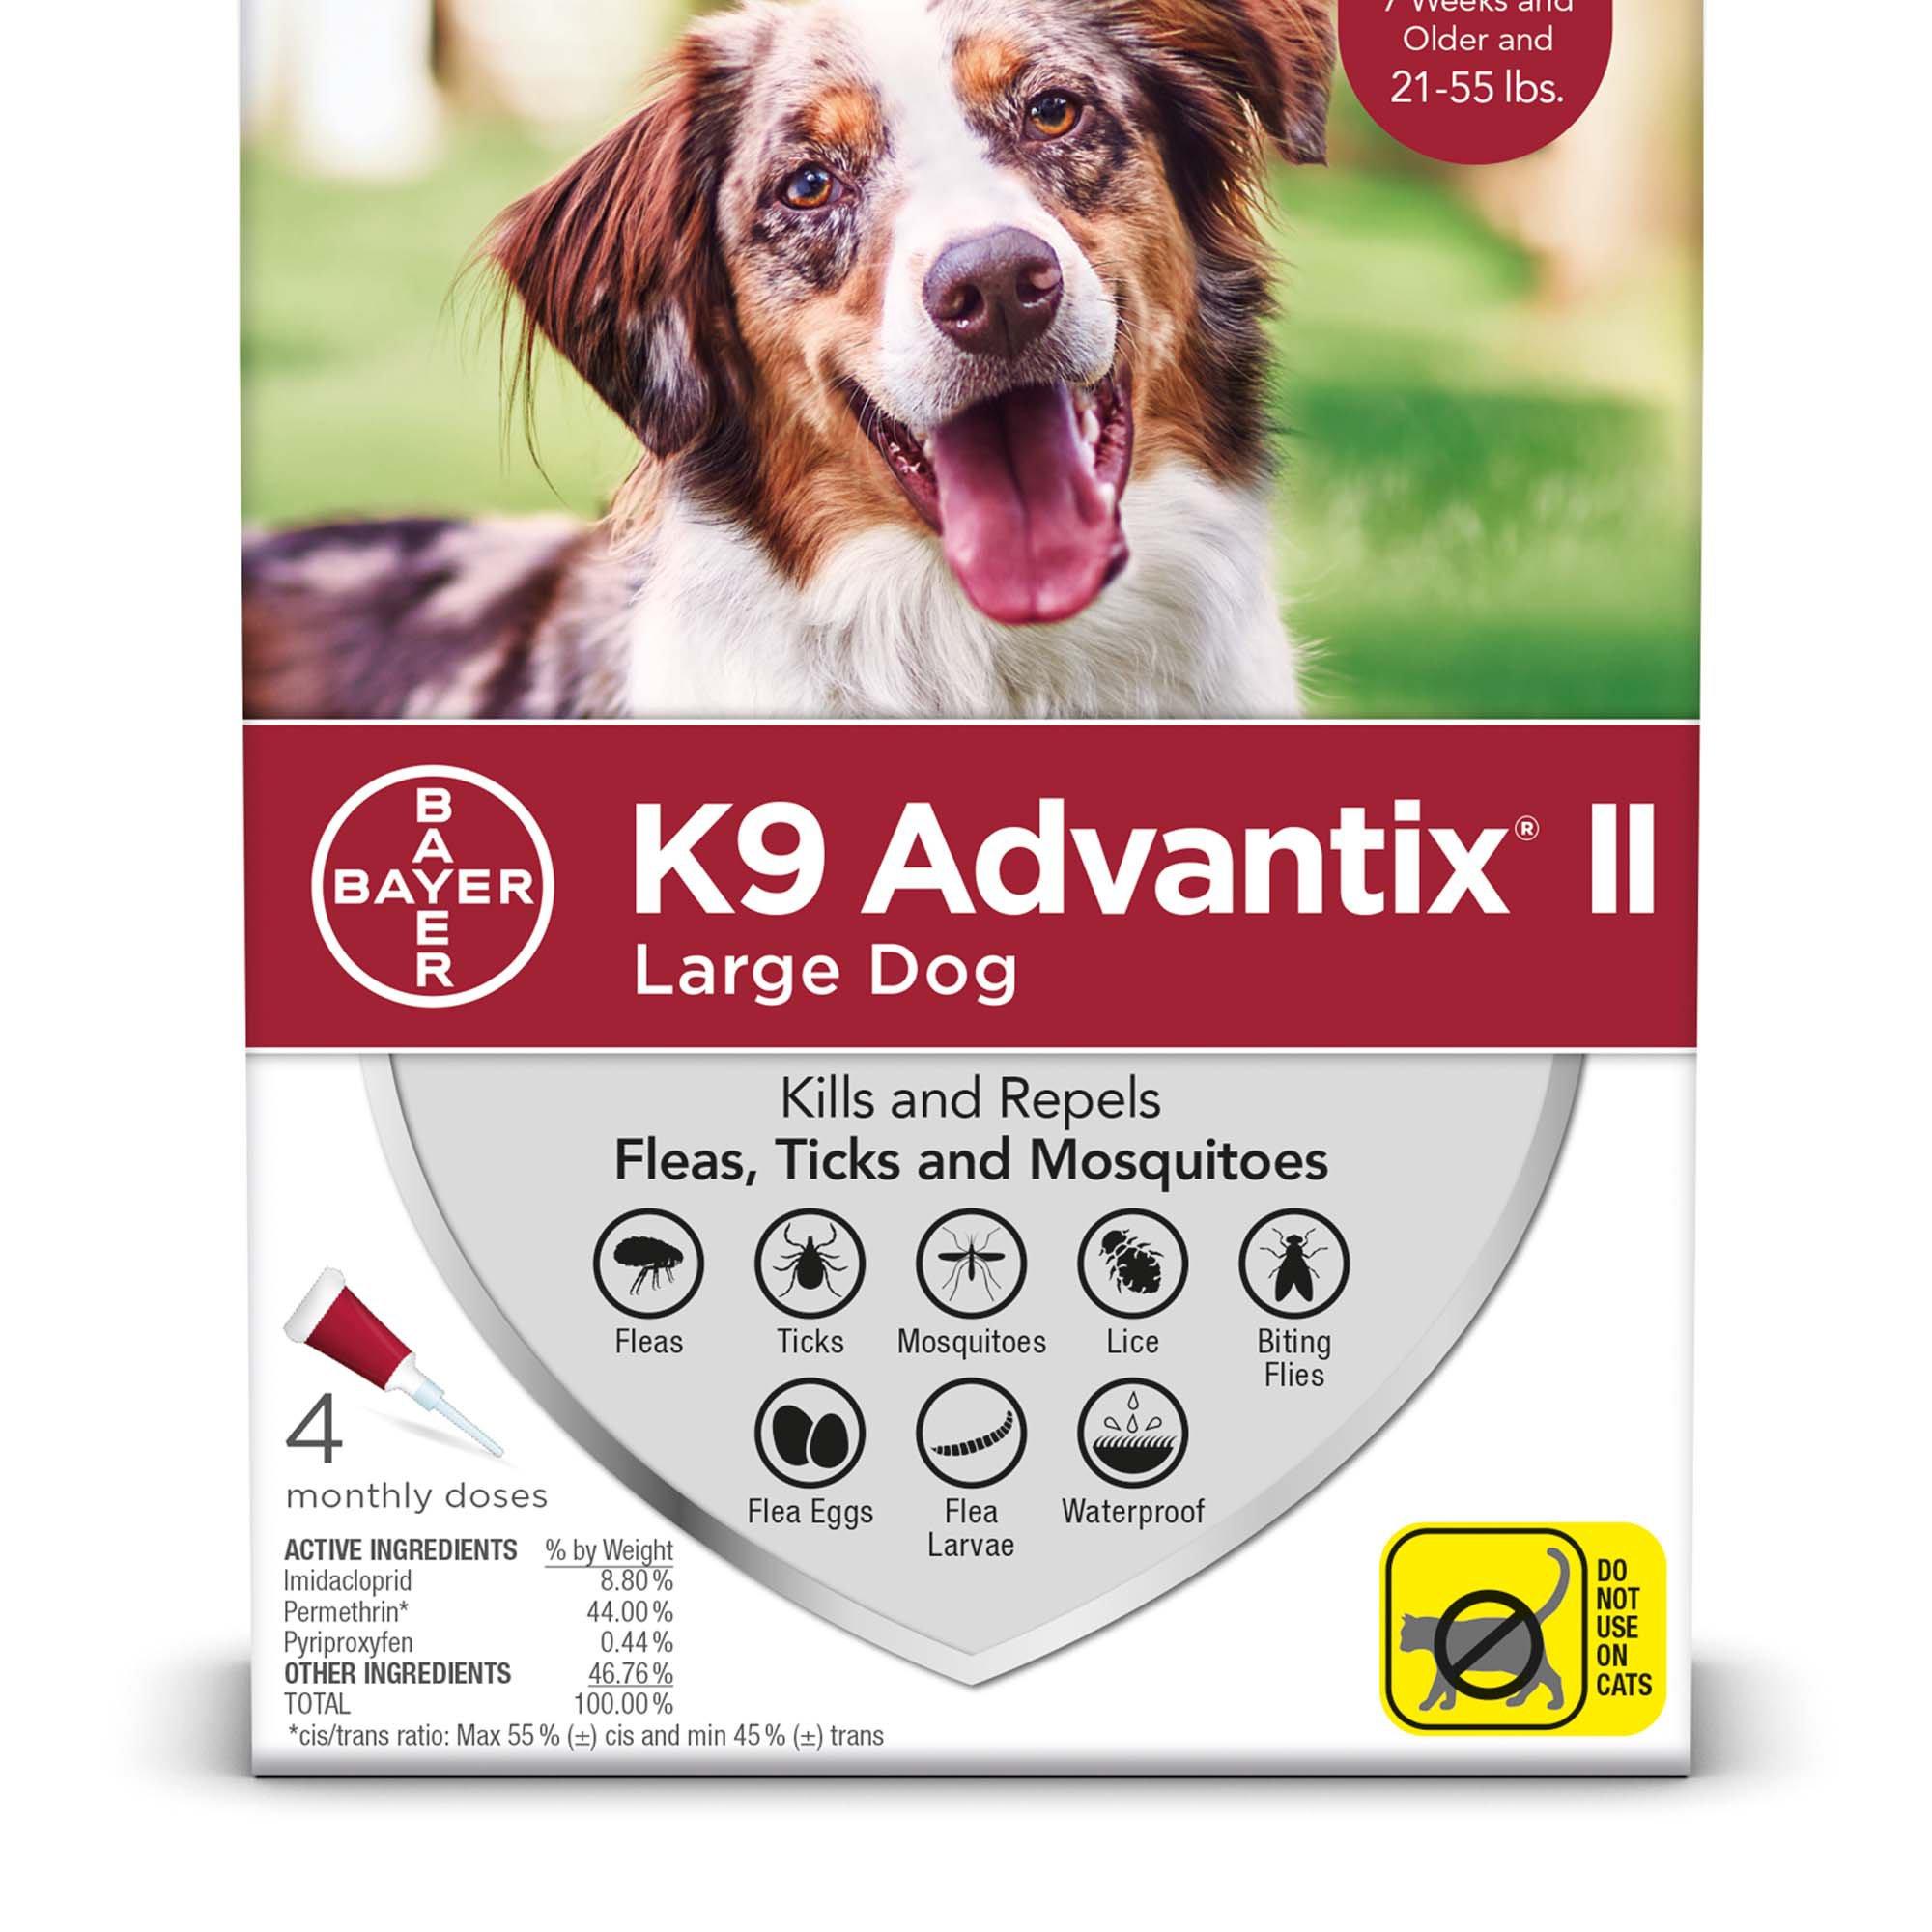 Bayer K9 Advantix II Flea & Tick Treatment for Large Dogs 21-55 lbs, 4-pk